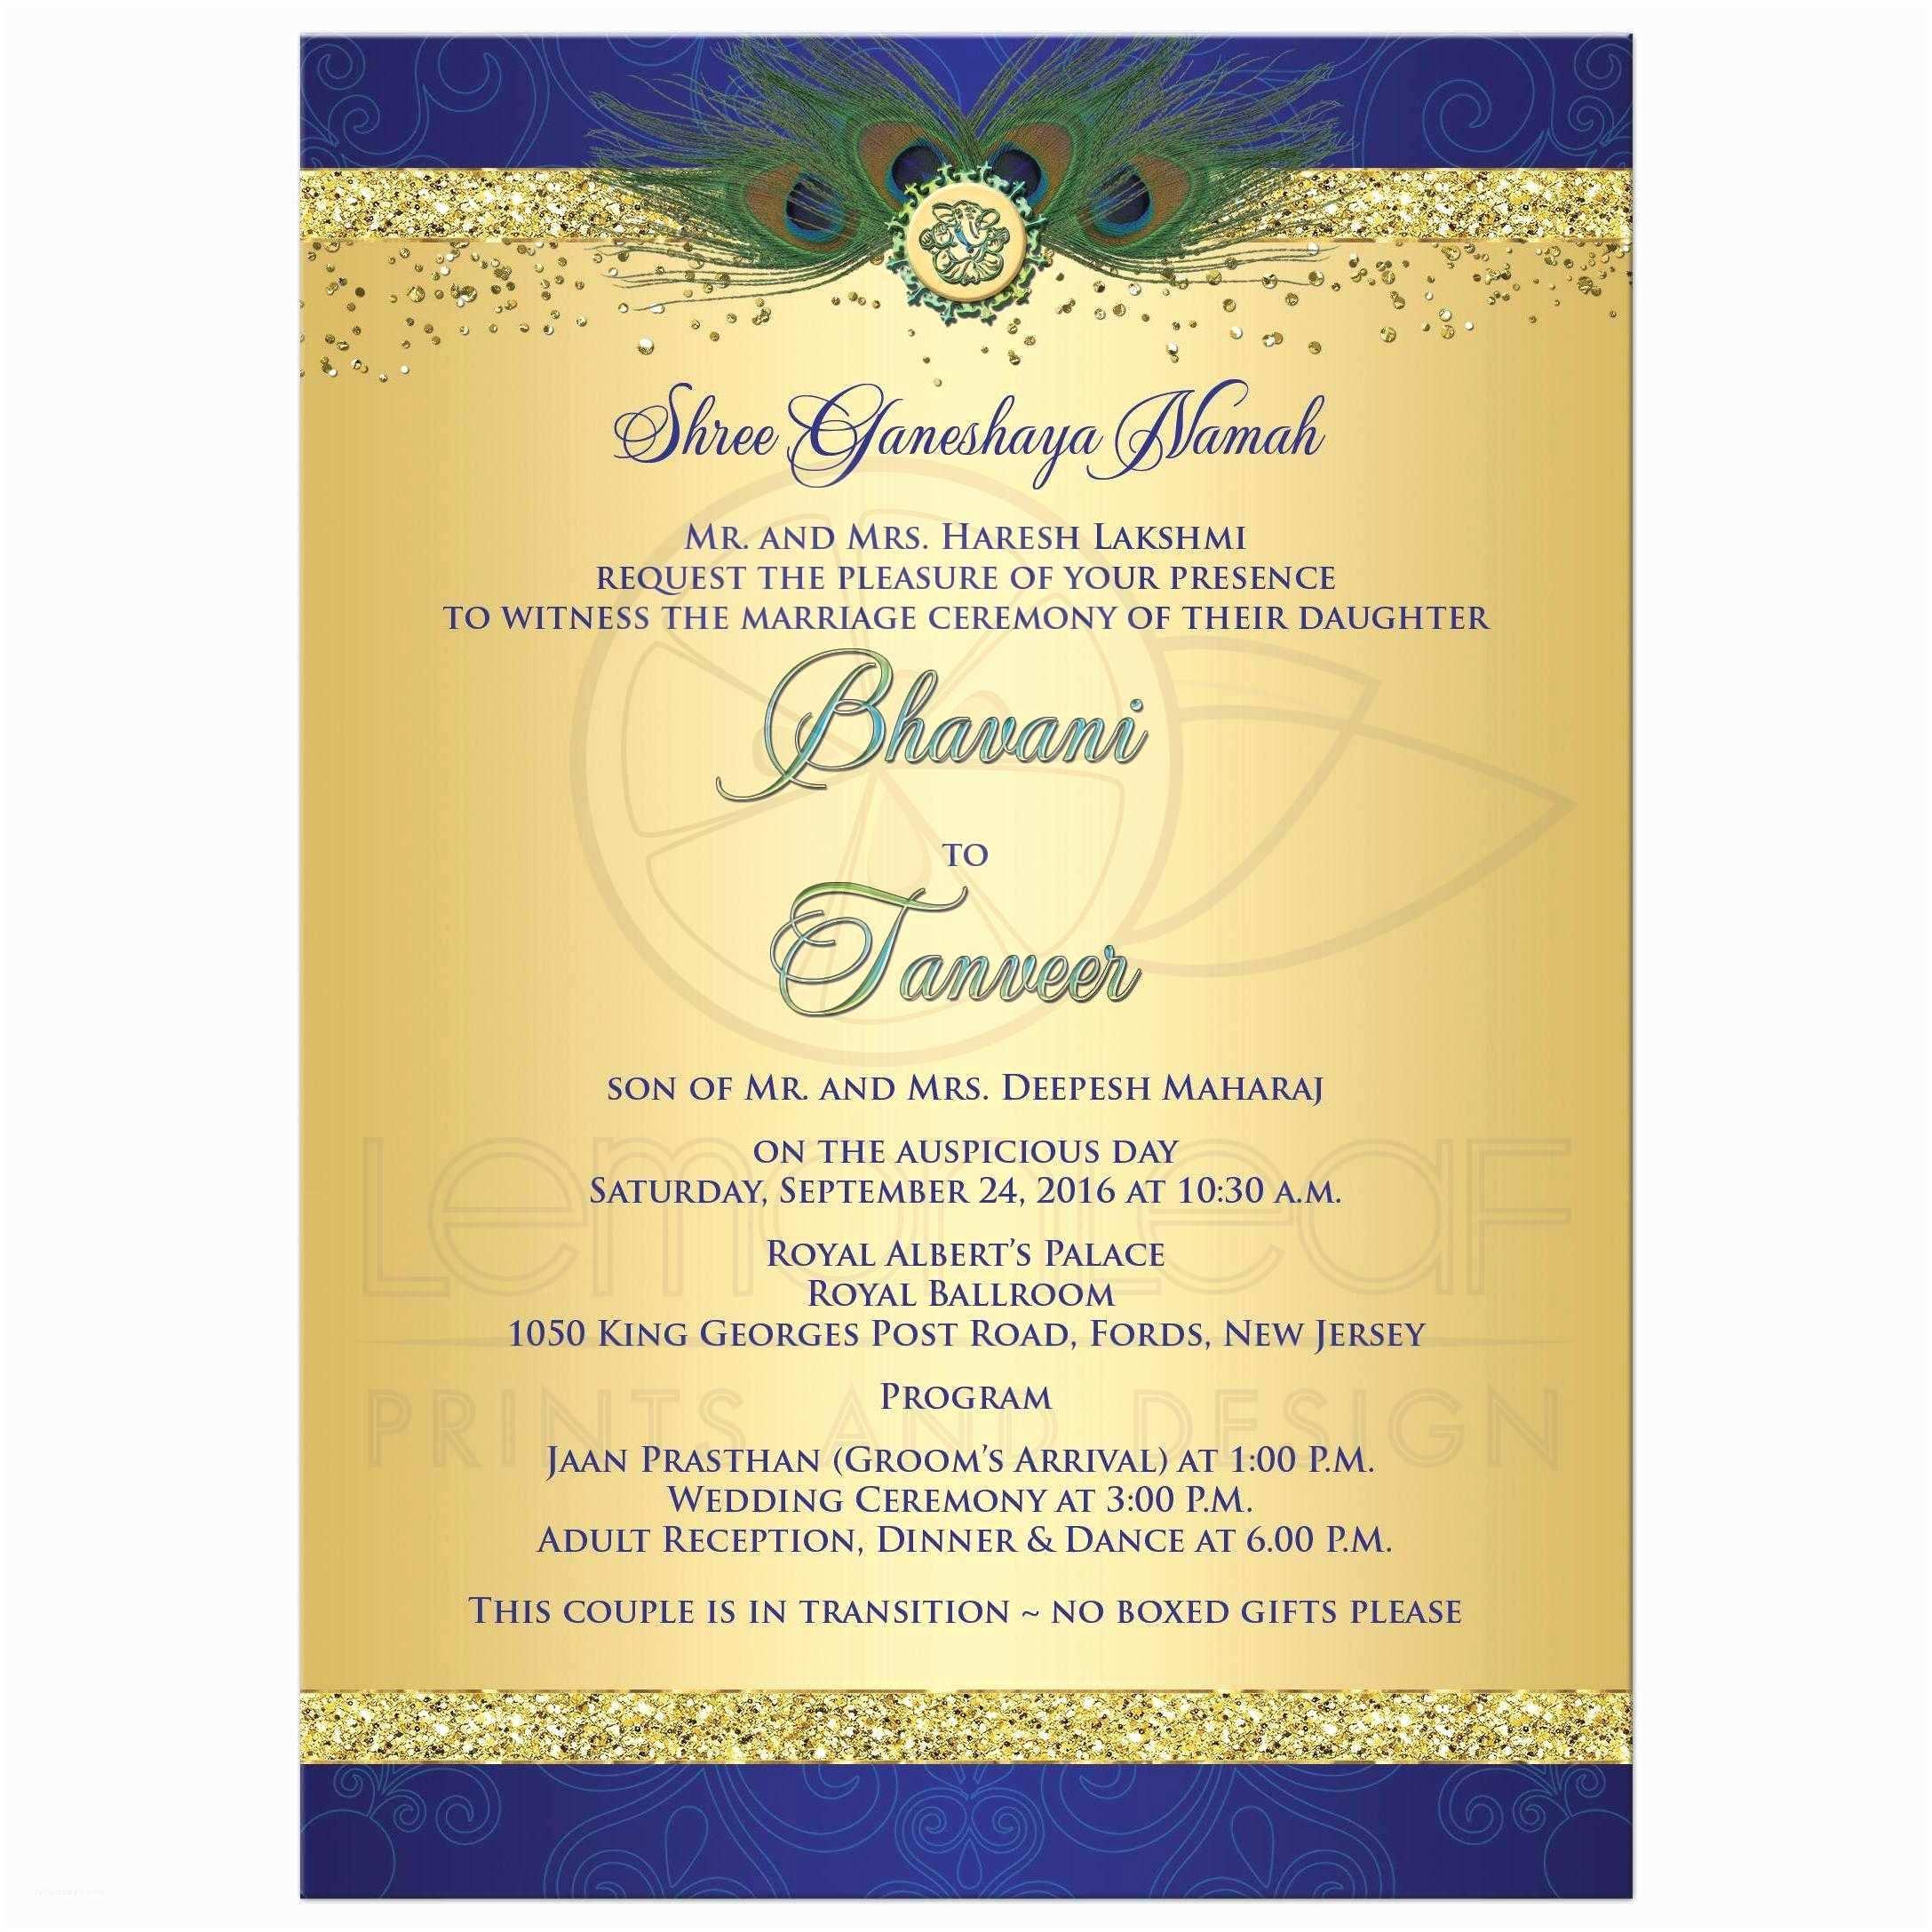 Make Indian Wedding Invitation Cards Online Free Indian Wedding Invitation Cards Indian Wedding